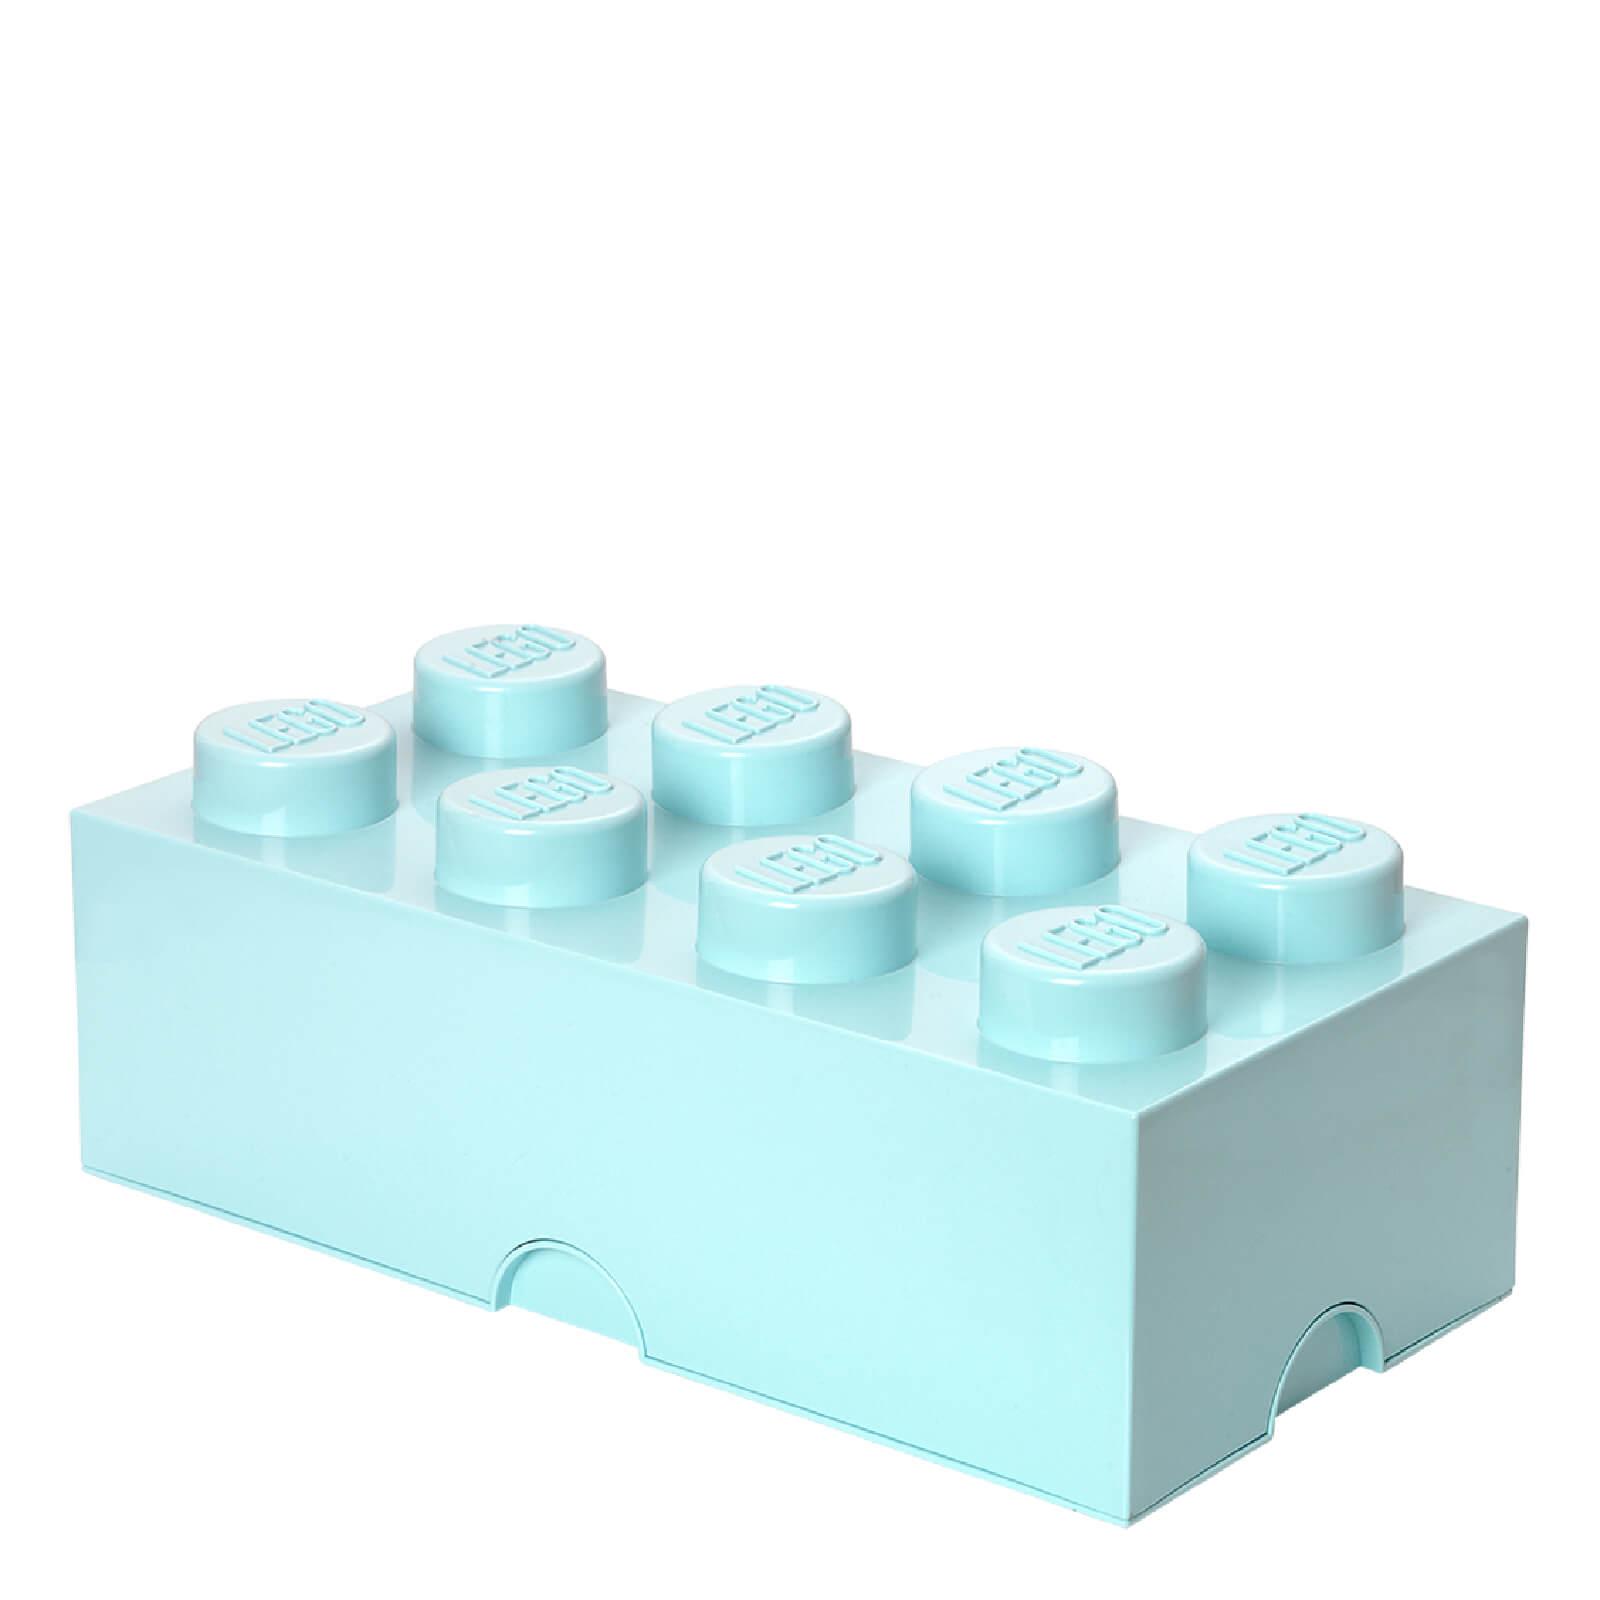 Lego Storage Brick 8 - Aqua